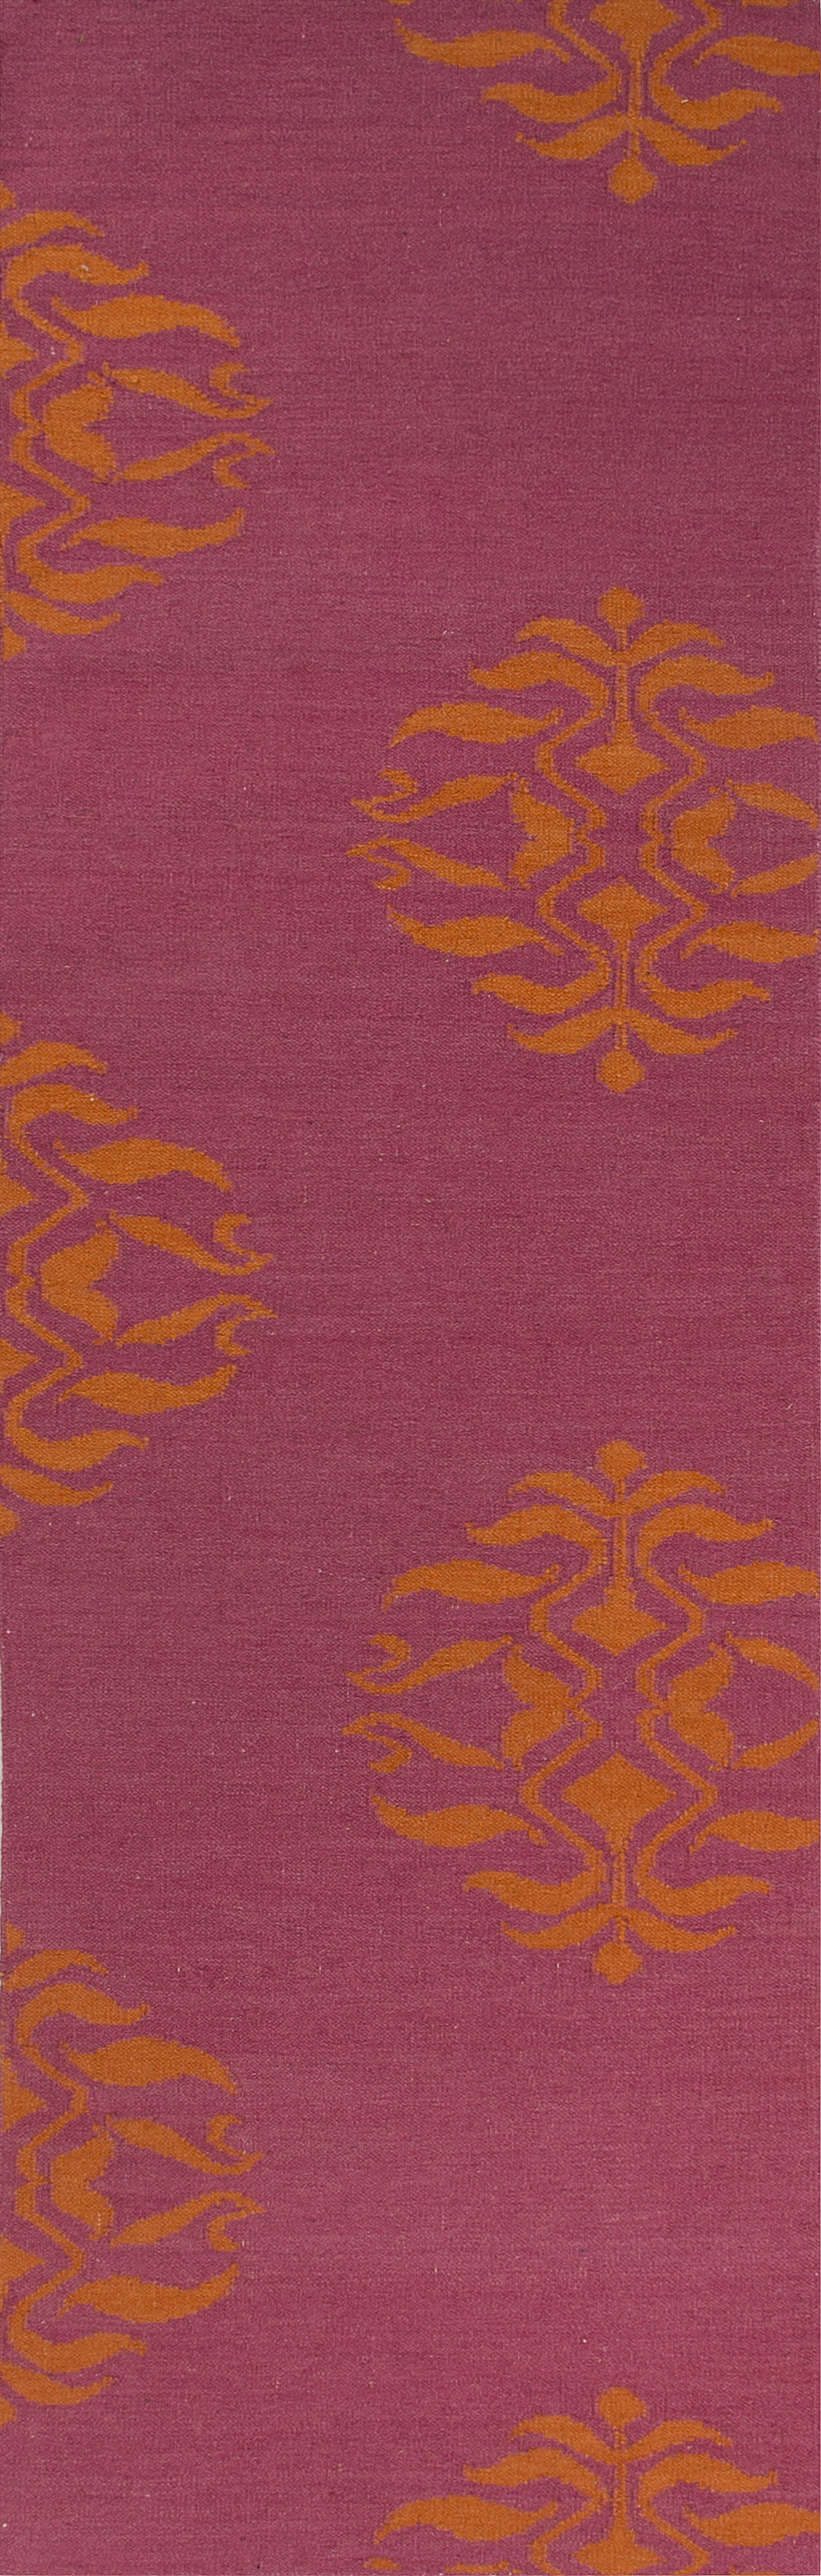 JAIPUR Rugs Maroc 2.6 x 8 Rug - Item Number: RUG102617